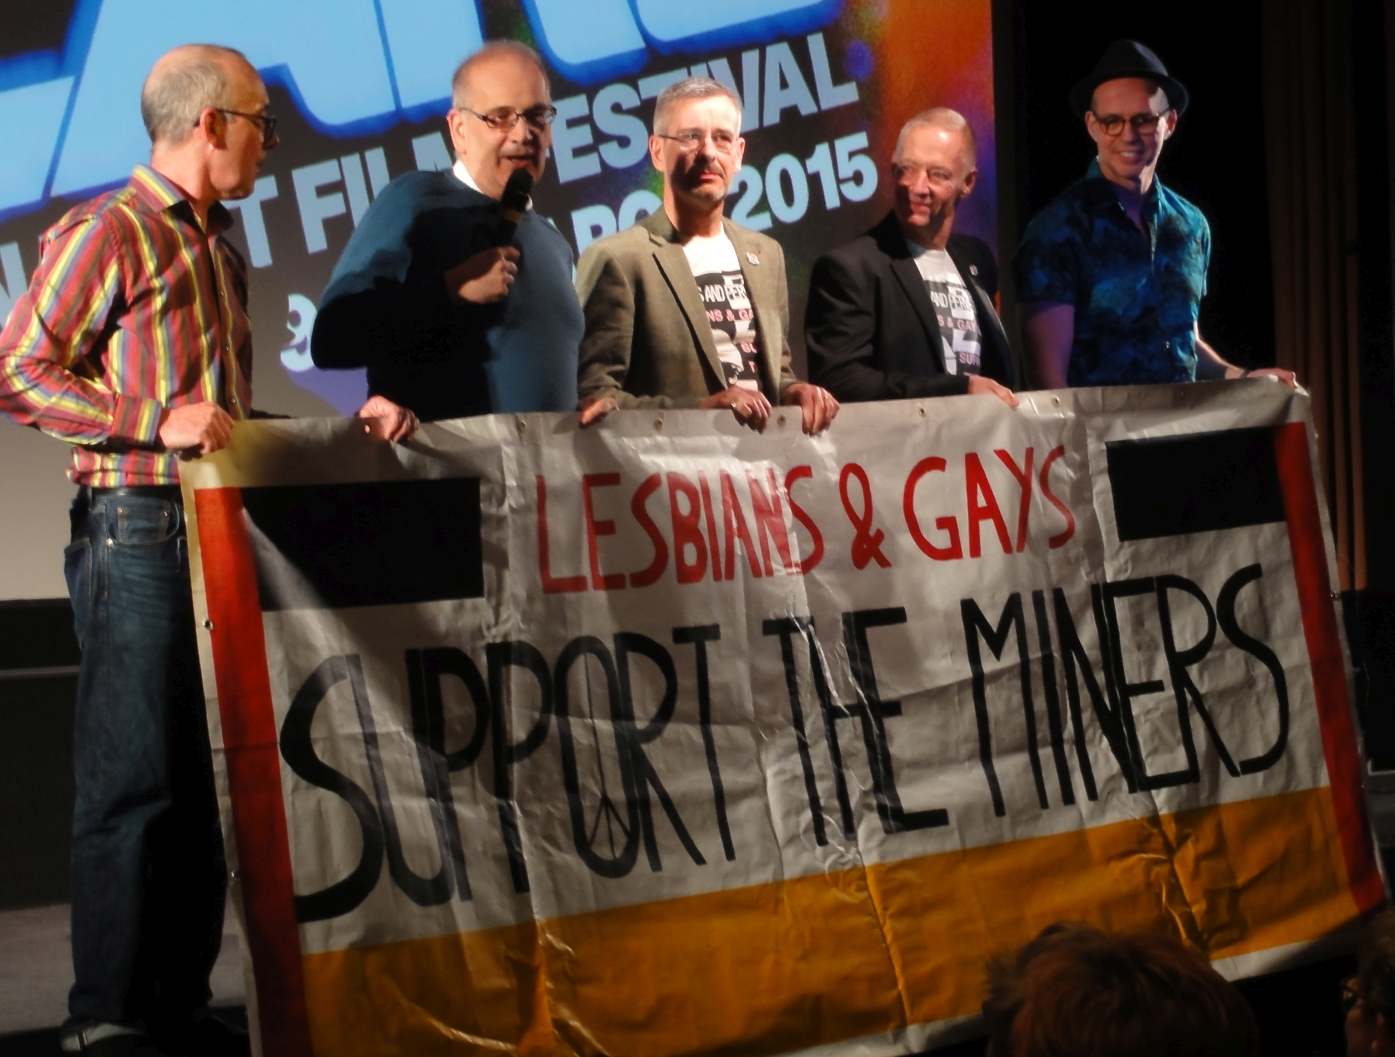 "Članovi <a href=""https://en.wikipedia.org/wiki/Lesbians_and_Gays_Support_the_Miners"" target=""_blank"">LGSM-a</a> na eventu Britanskog filmskog instituta posvećenog filmu <a href=""https://en.wikipedia.org/wiki/Pride_%282014_film%29"" target=""_blank"">Pride</a> (izvor: <a href=""https://commons.wikimedia.org/wiki/File:LGSM_at_the_BFI.JPG"" target=""_blank"">commons.wikimedia.org</a>)."